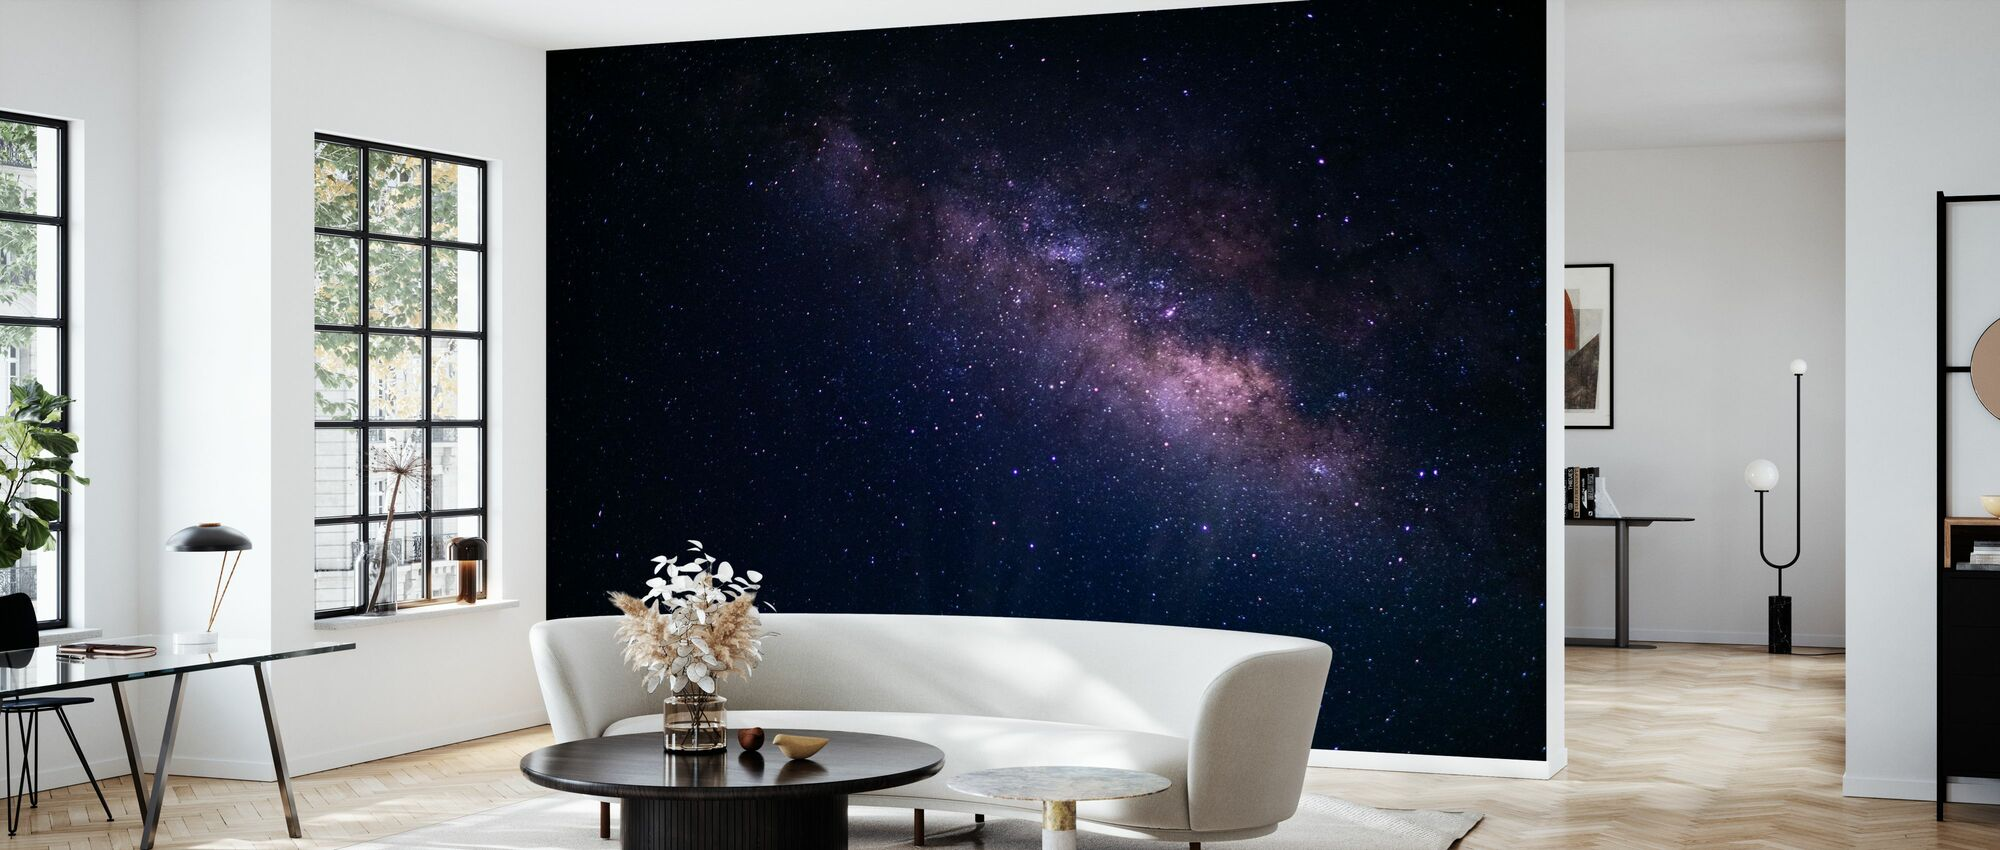 Milky Way Galaxy - Wallpaper - Living Room